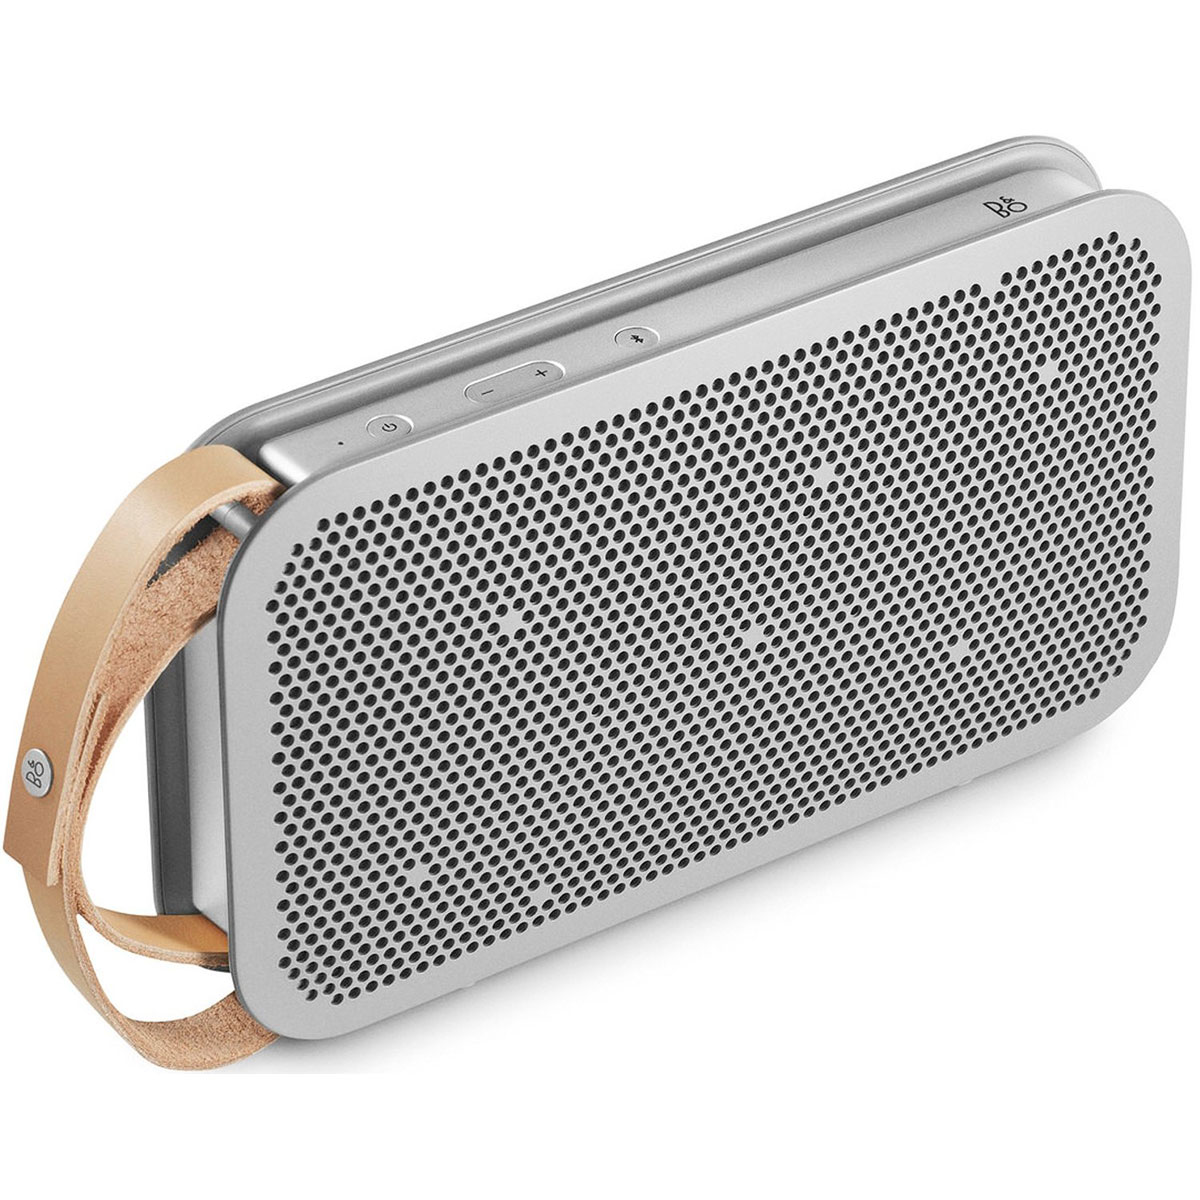 Dock & Enceinte Bluetooth B&O Play Beoplay A2 Sable Lunaire Enceinte stéréo Bluetooth